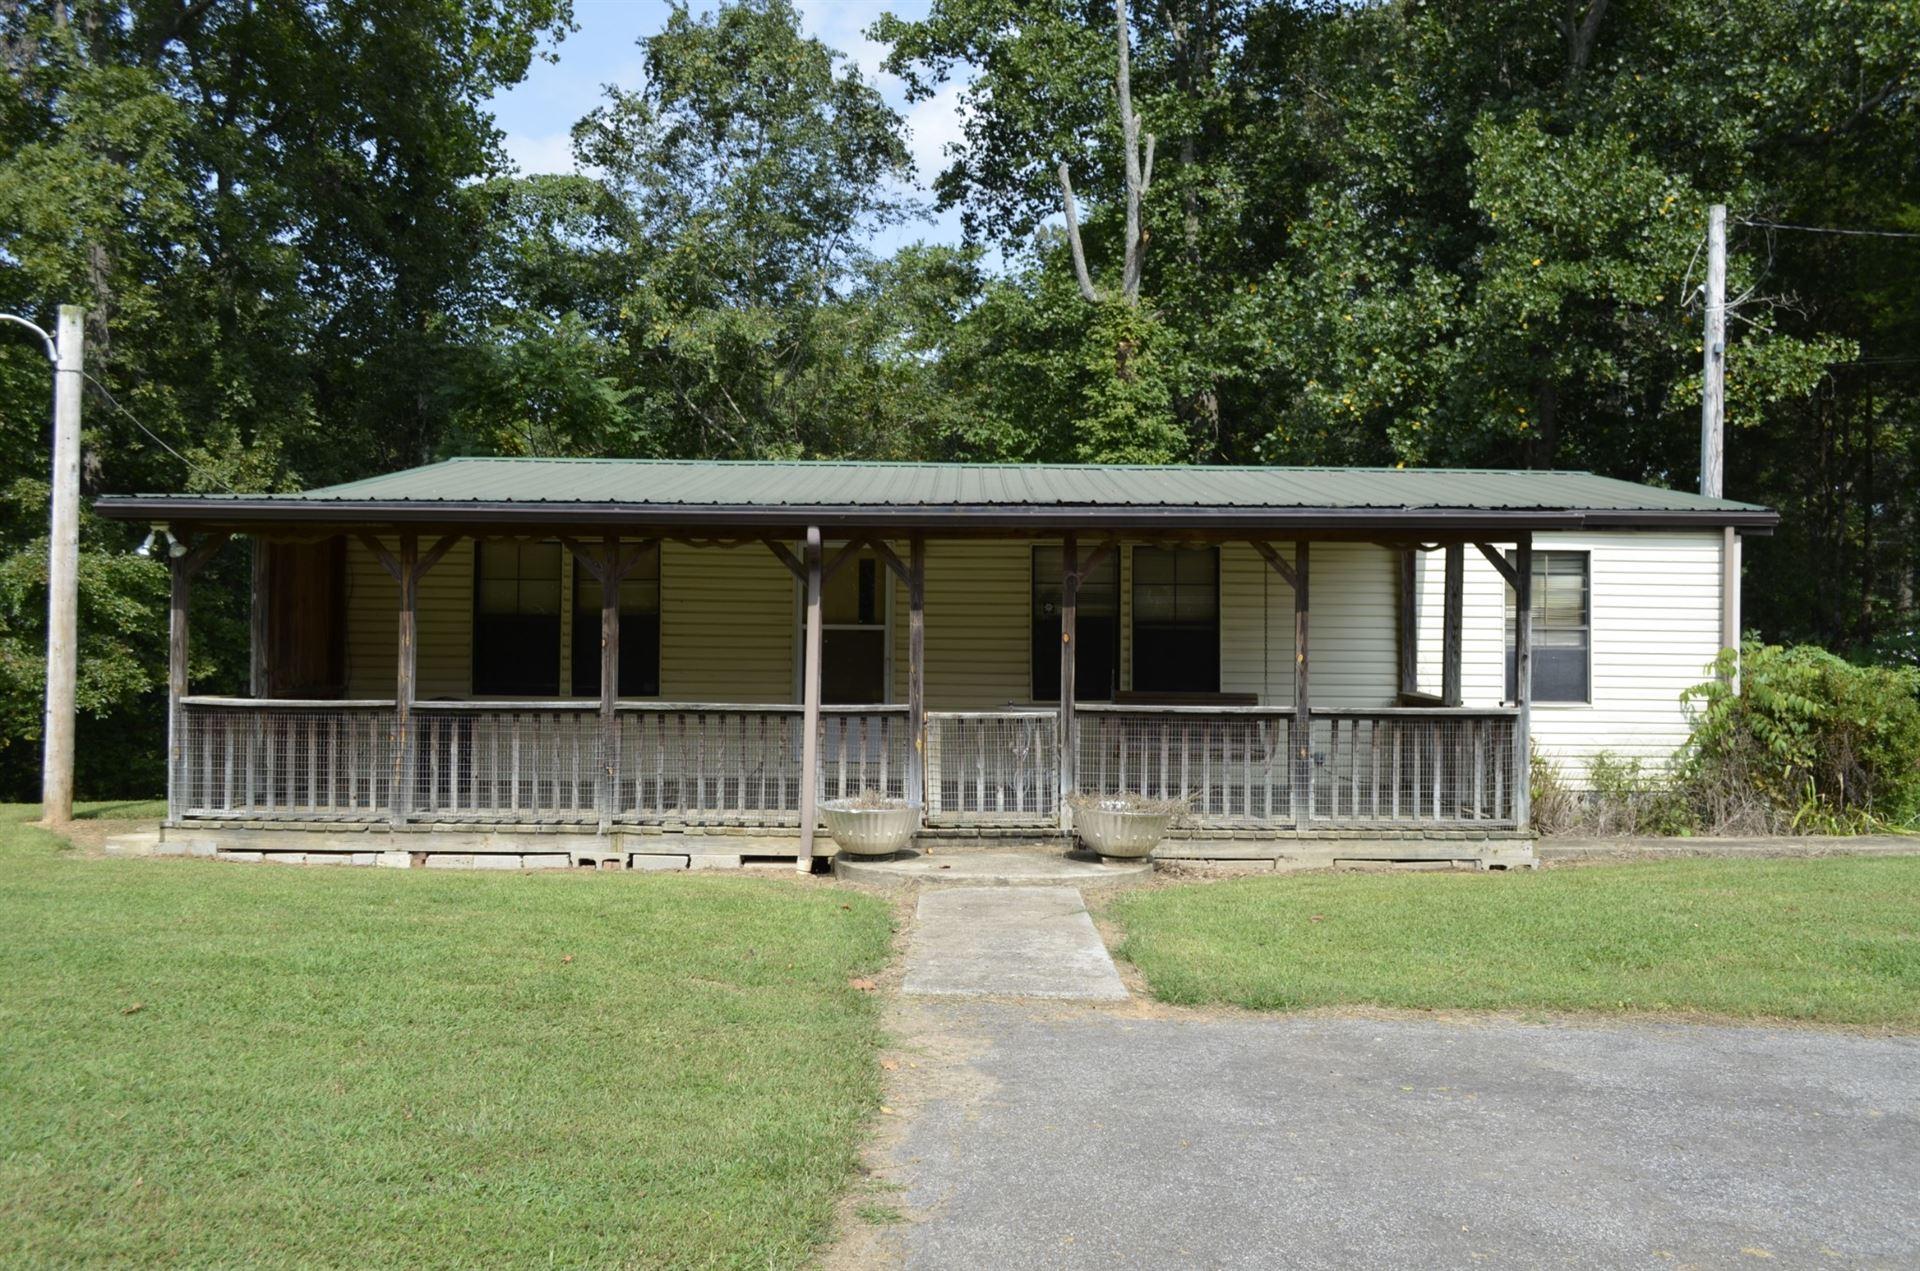 1036 Ross Ln, Clarksville, TN 37042 - MLS#: 2190342